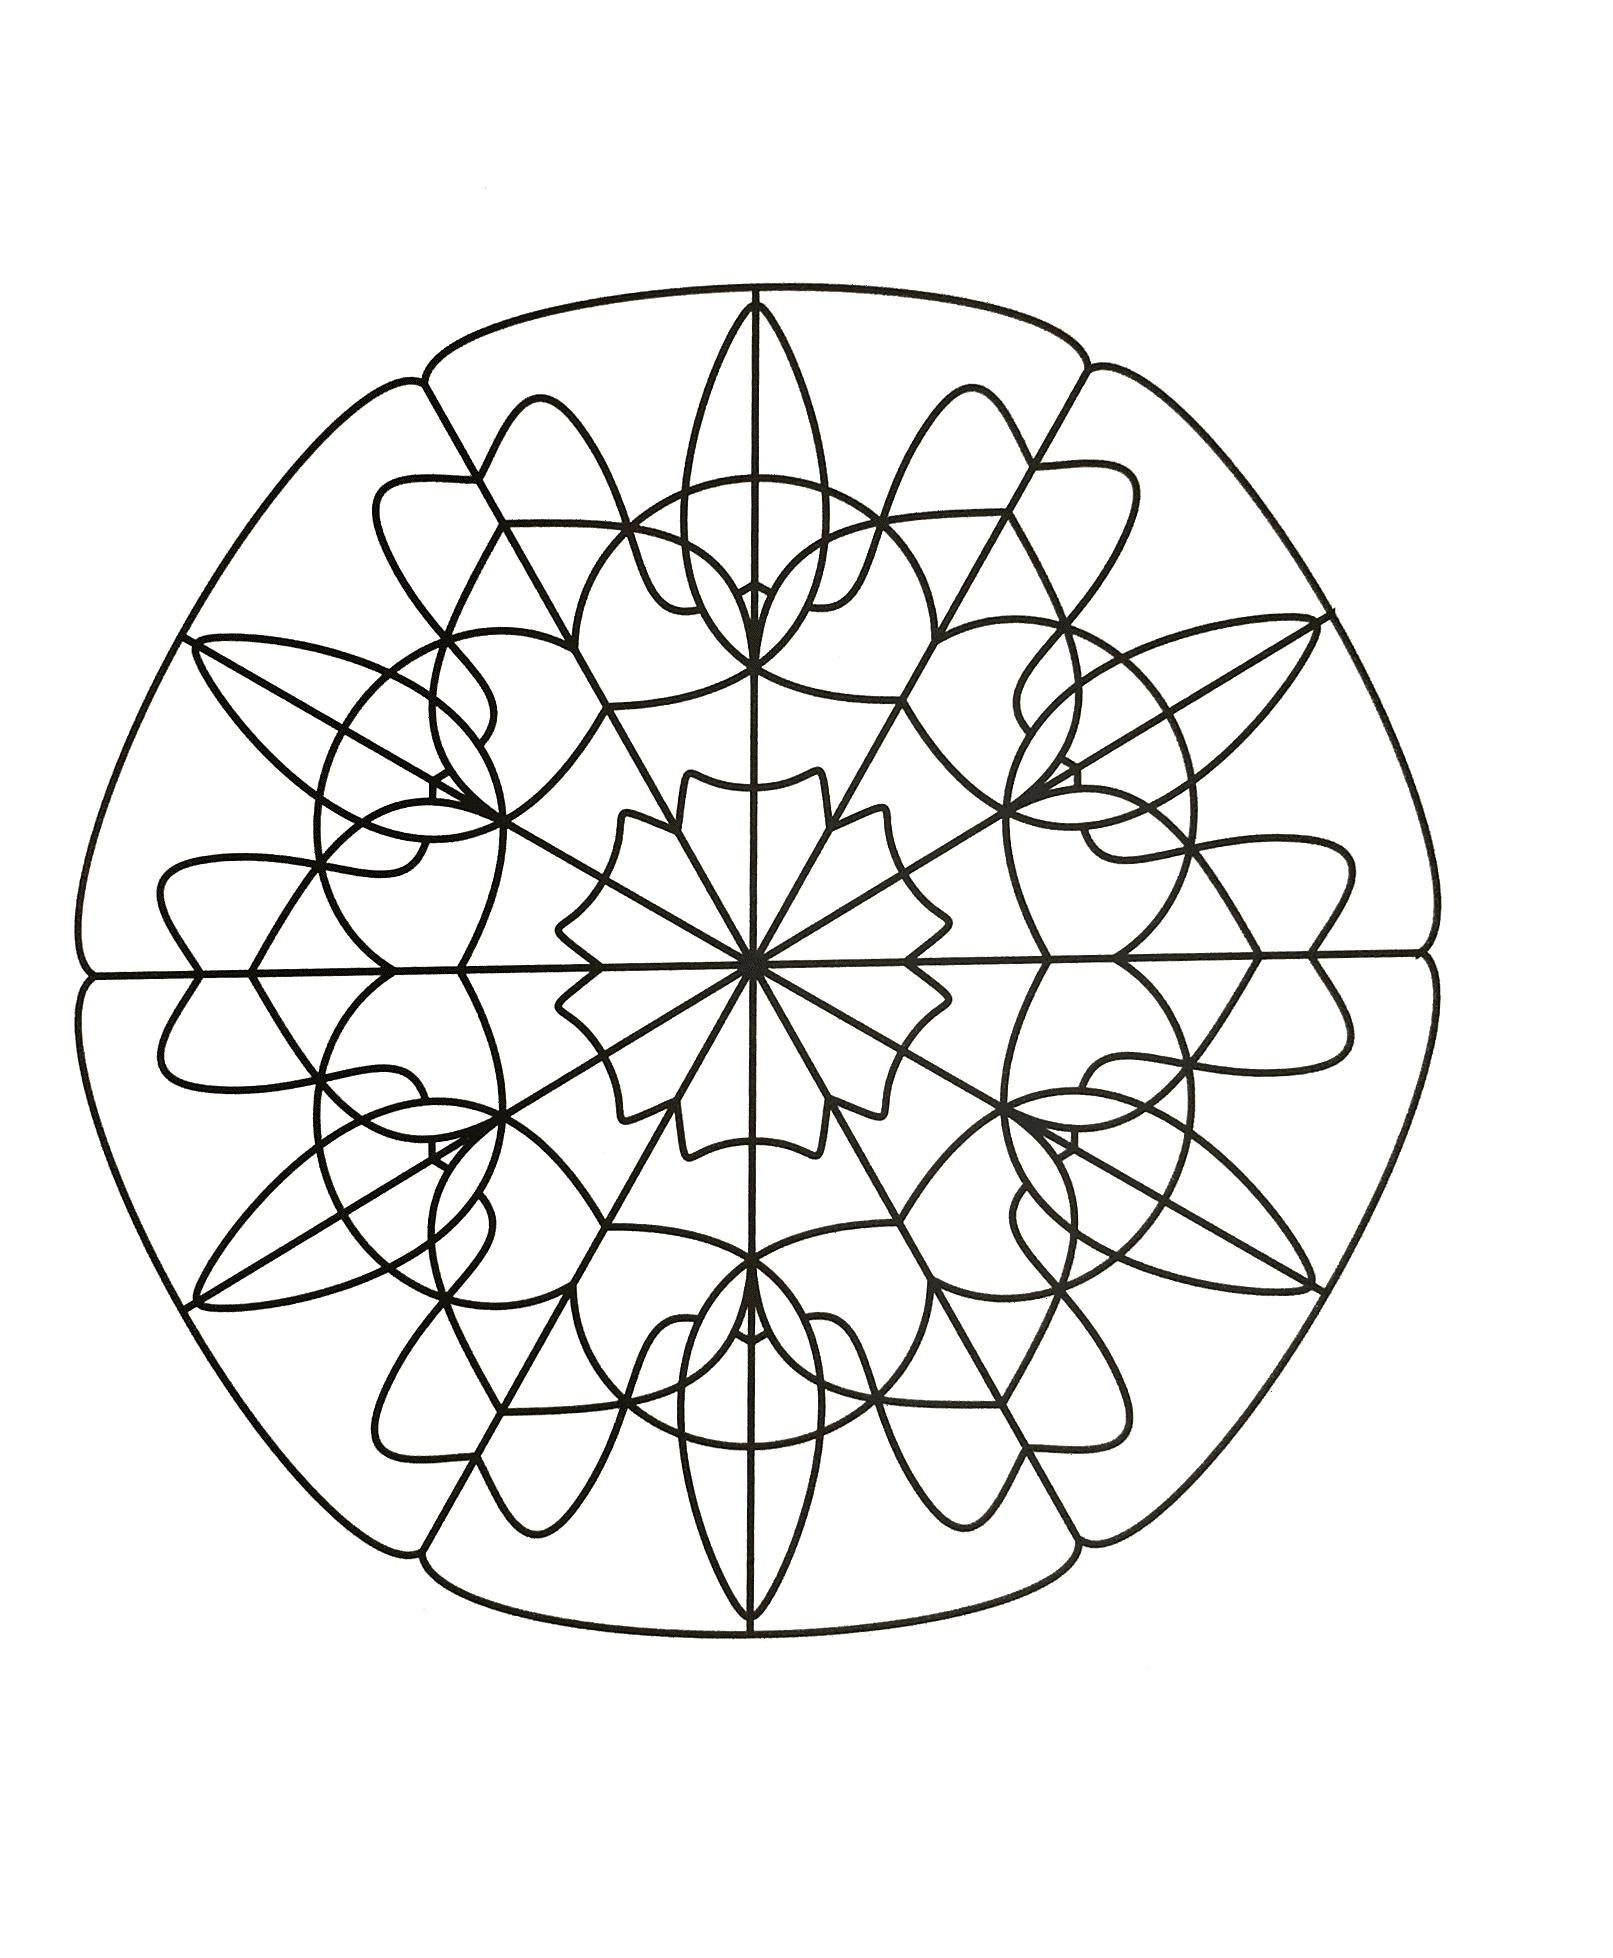 Strange & hypnotic Mandala Mandalas with Geometric